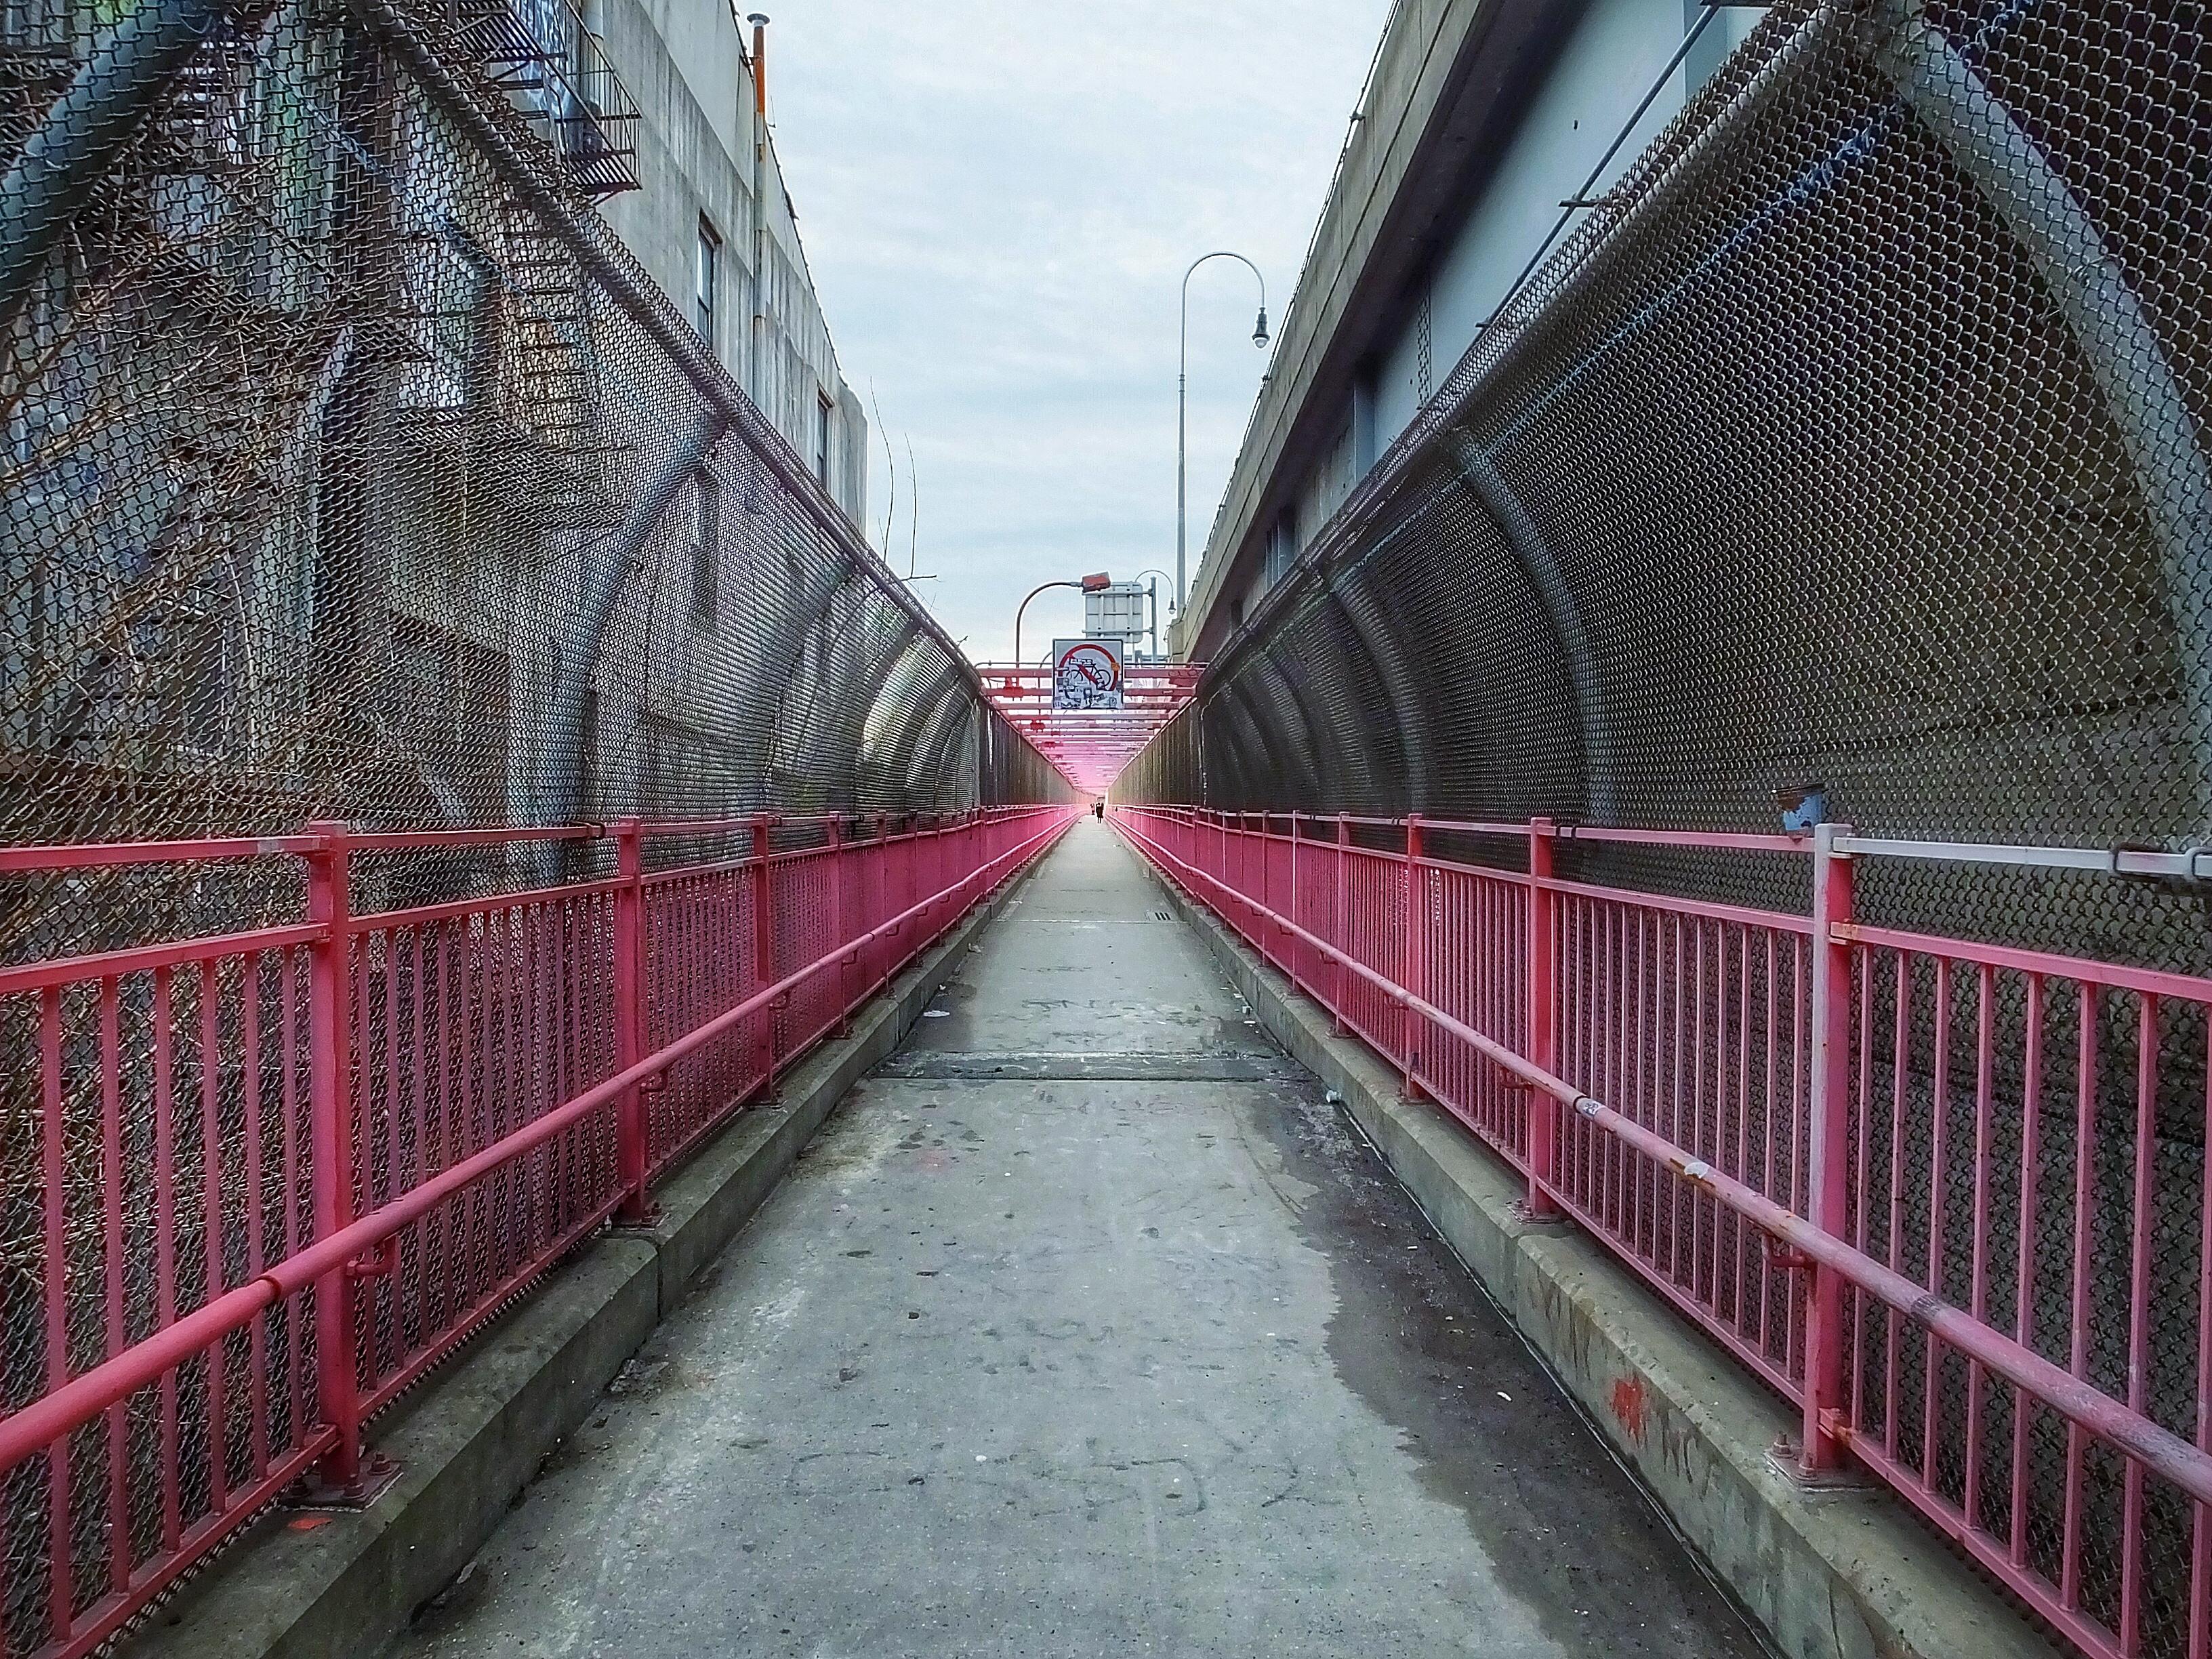 2014-01-24 Canada - Ontario - Toronto - 14 John street - Fotos editadas - 2014 USA New York Brooklyn